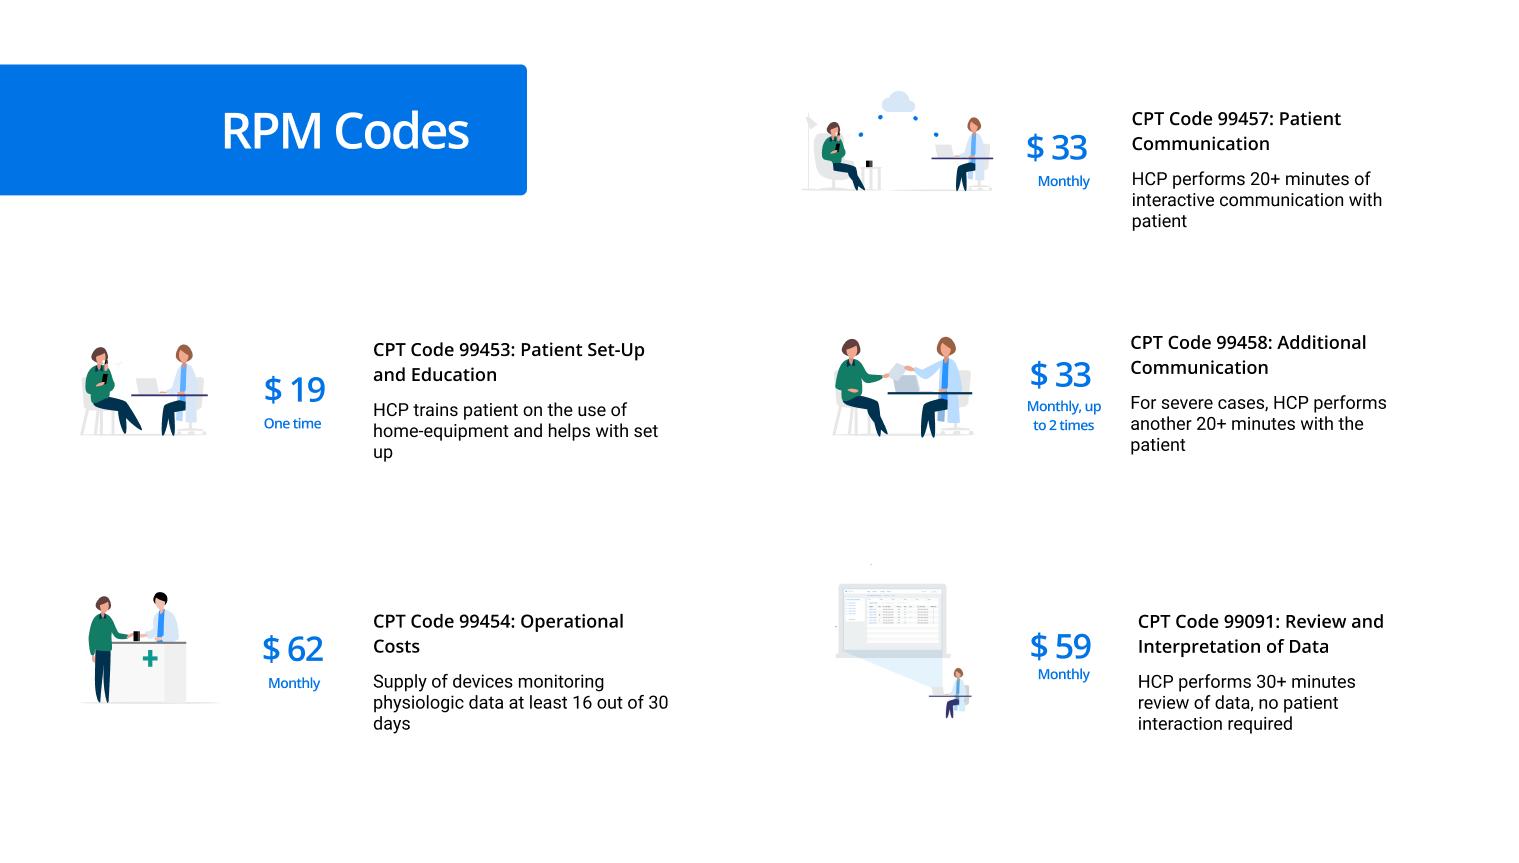 https://www.nuvoair.com/static/assets/img/RMP-codes.png